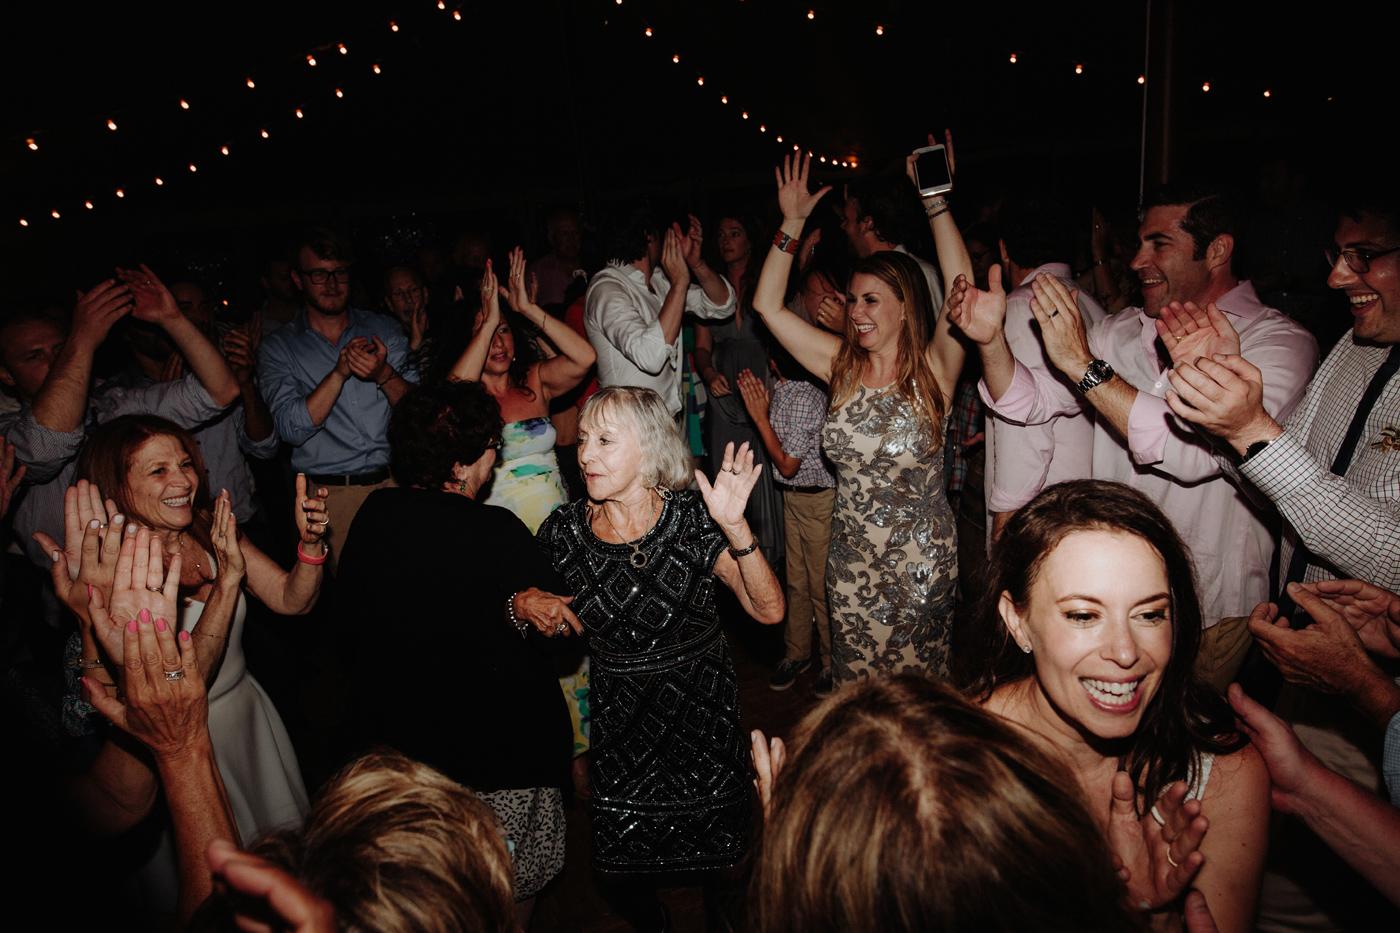 136-grand-teton-jackson-hole-wyoming-wedding.jpg